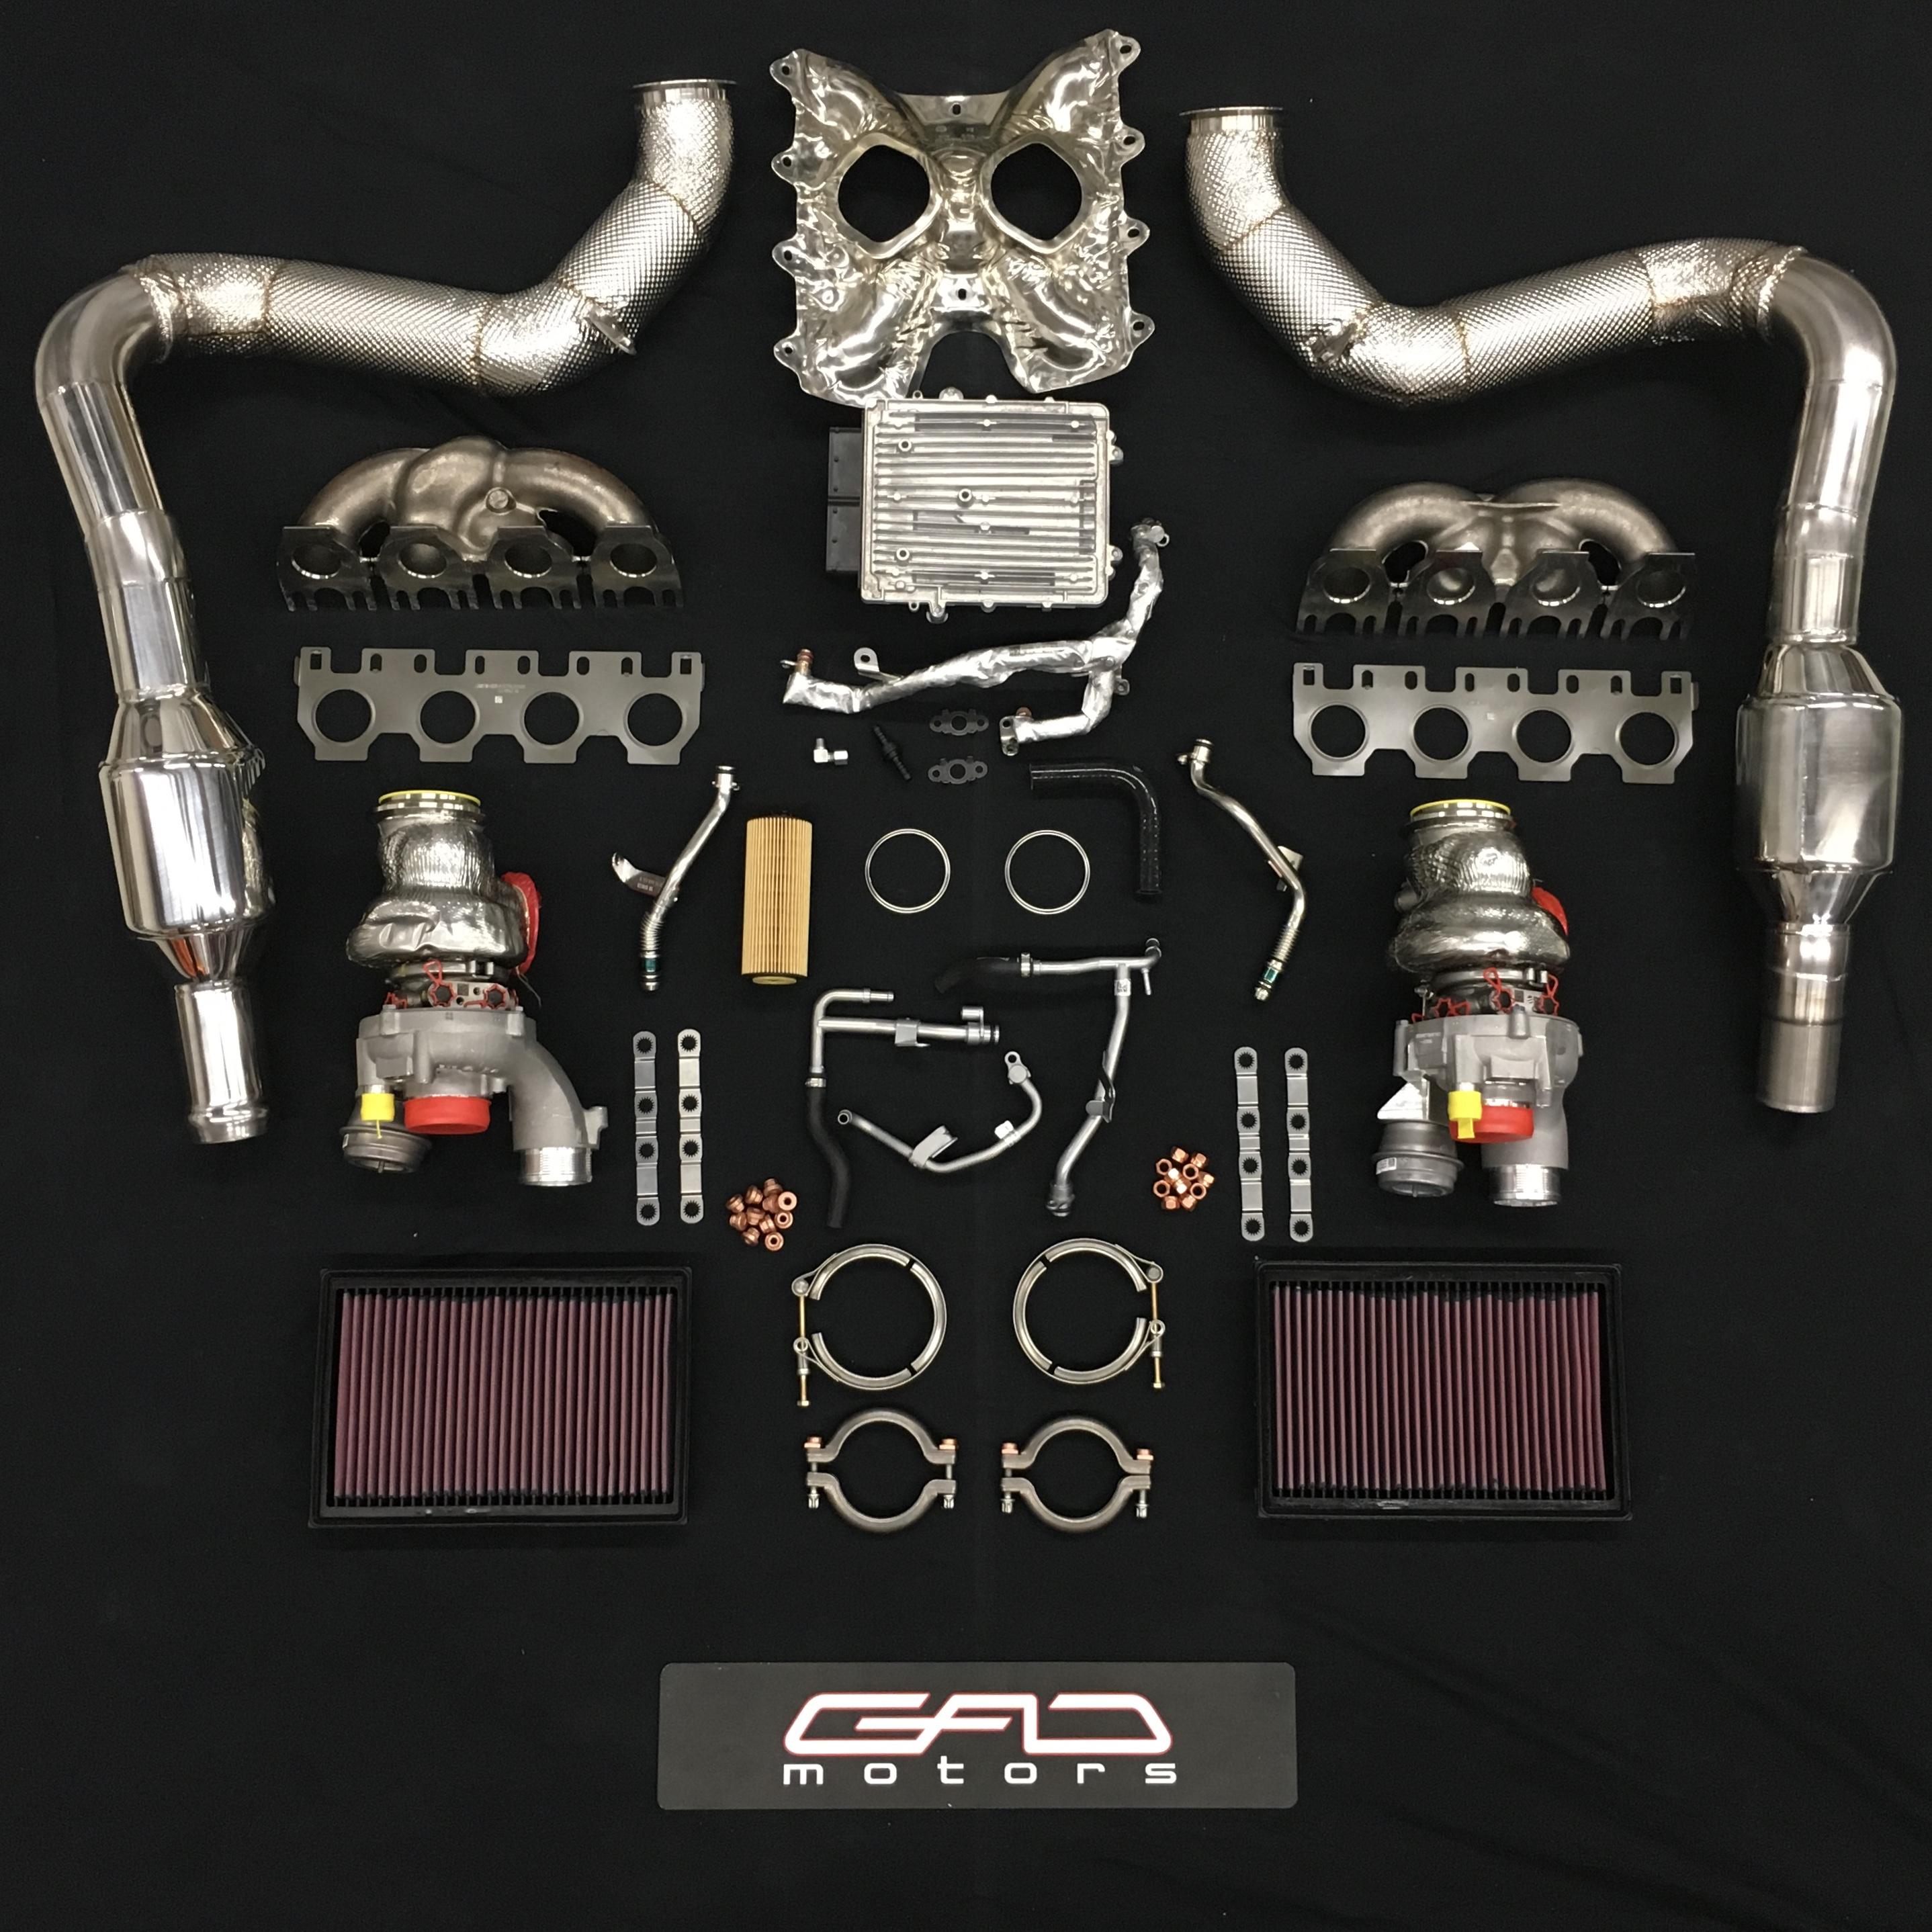 Stage 3 GAD-Motors